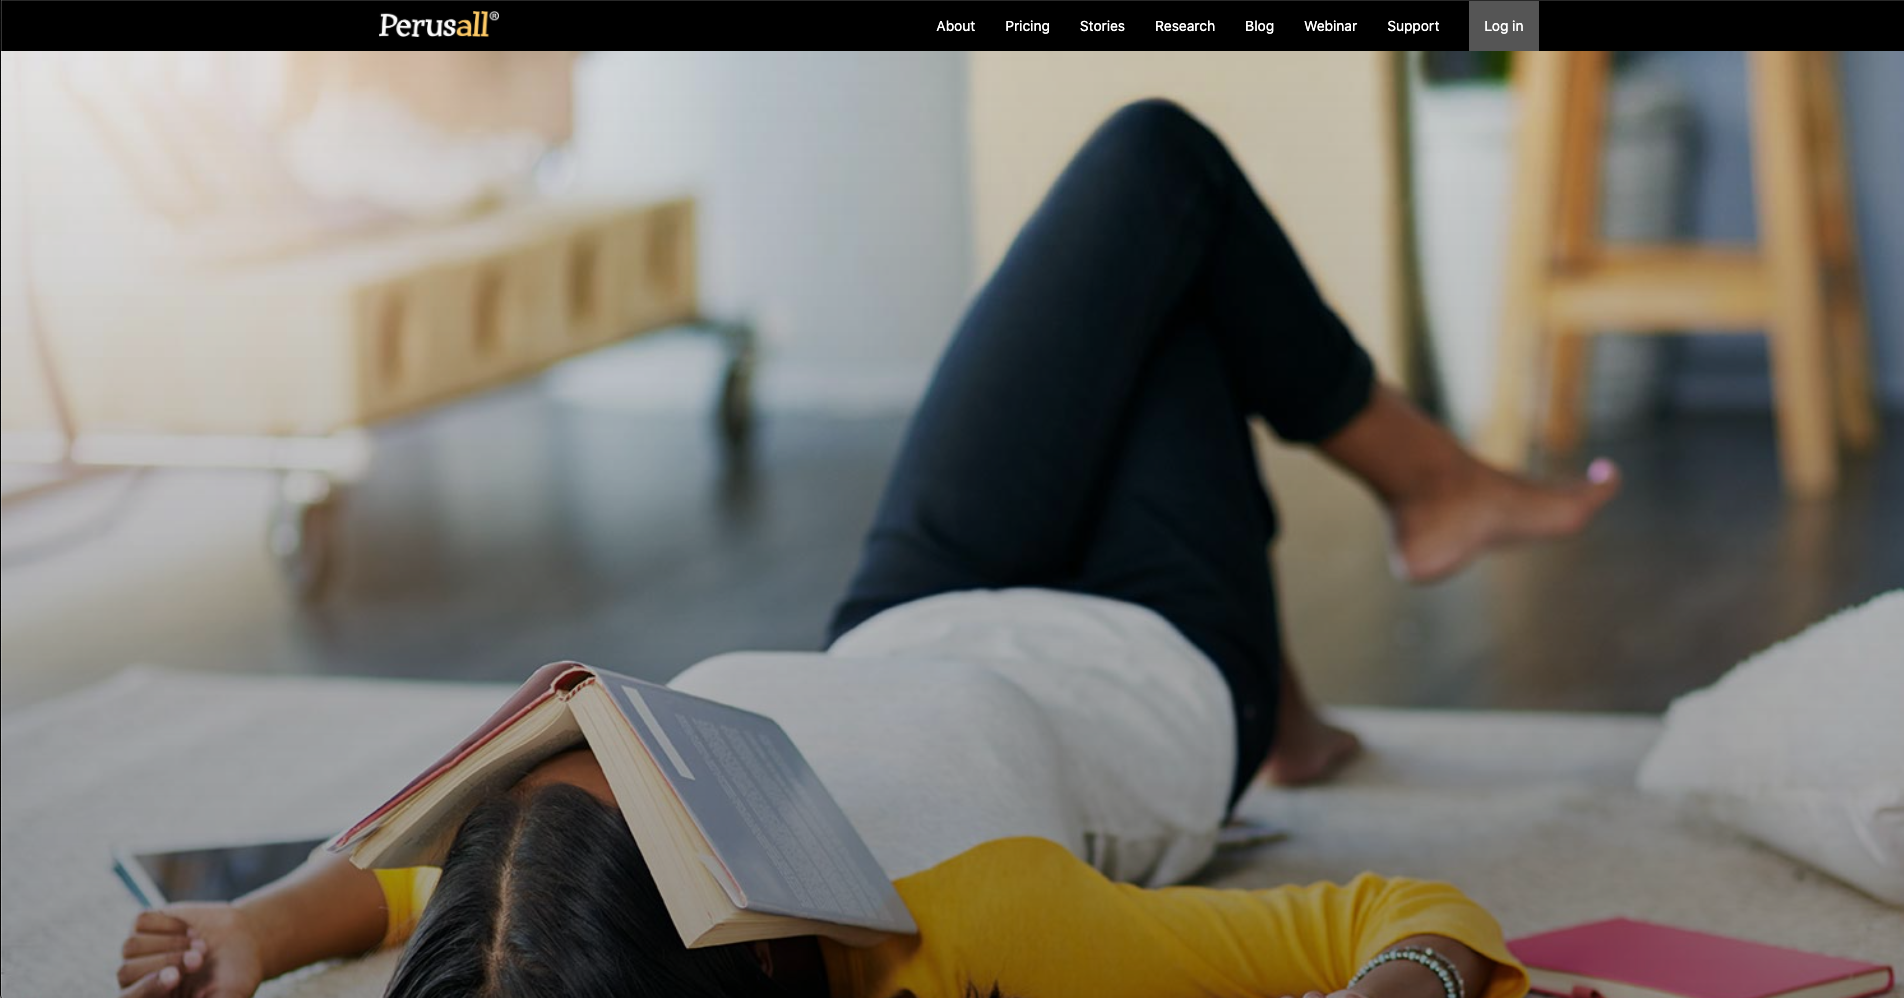 Splash screen on the Perusall homepage